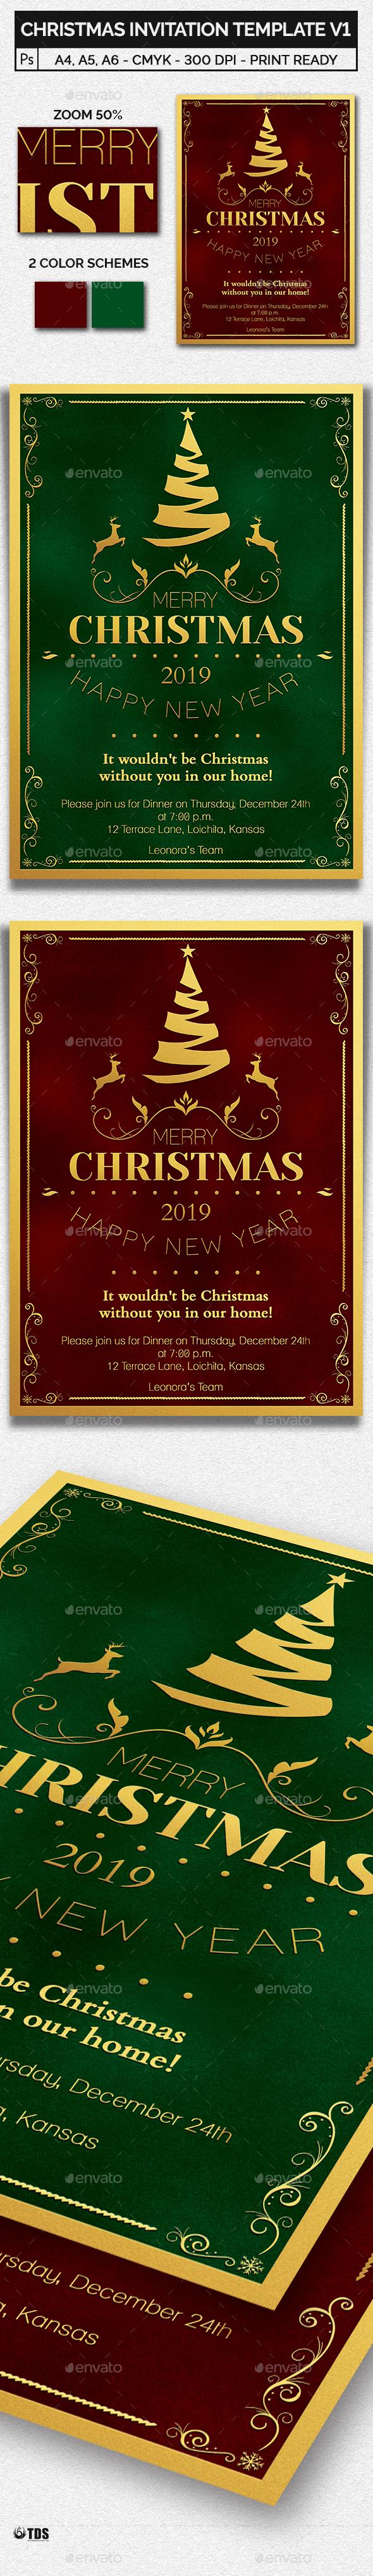 Christmas Invitation Template V1 - Invitations Cards & Invites